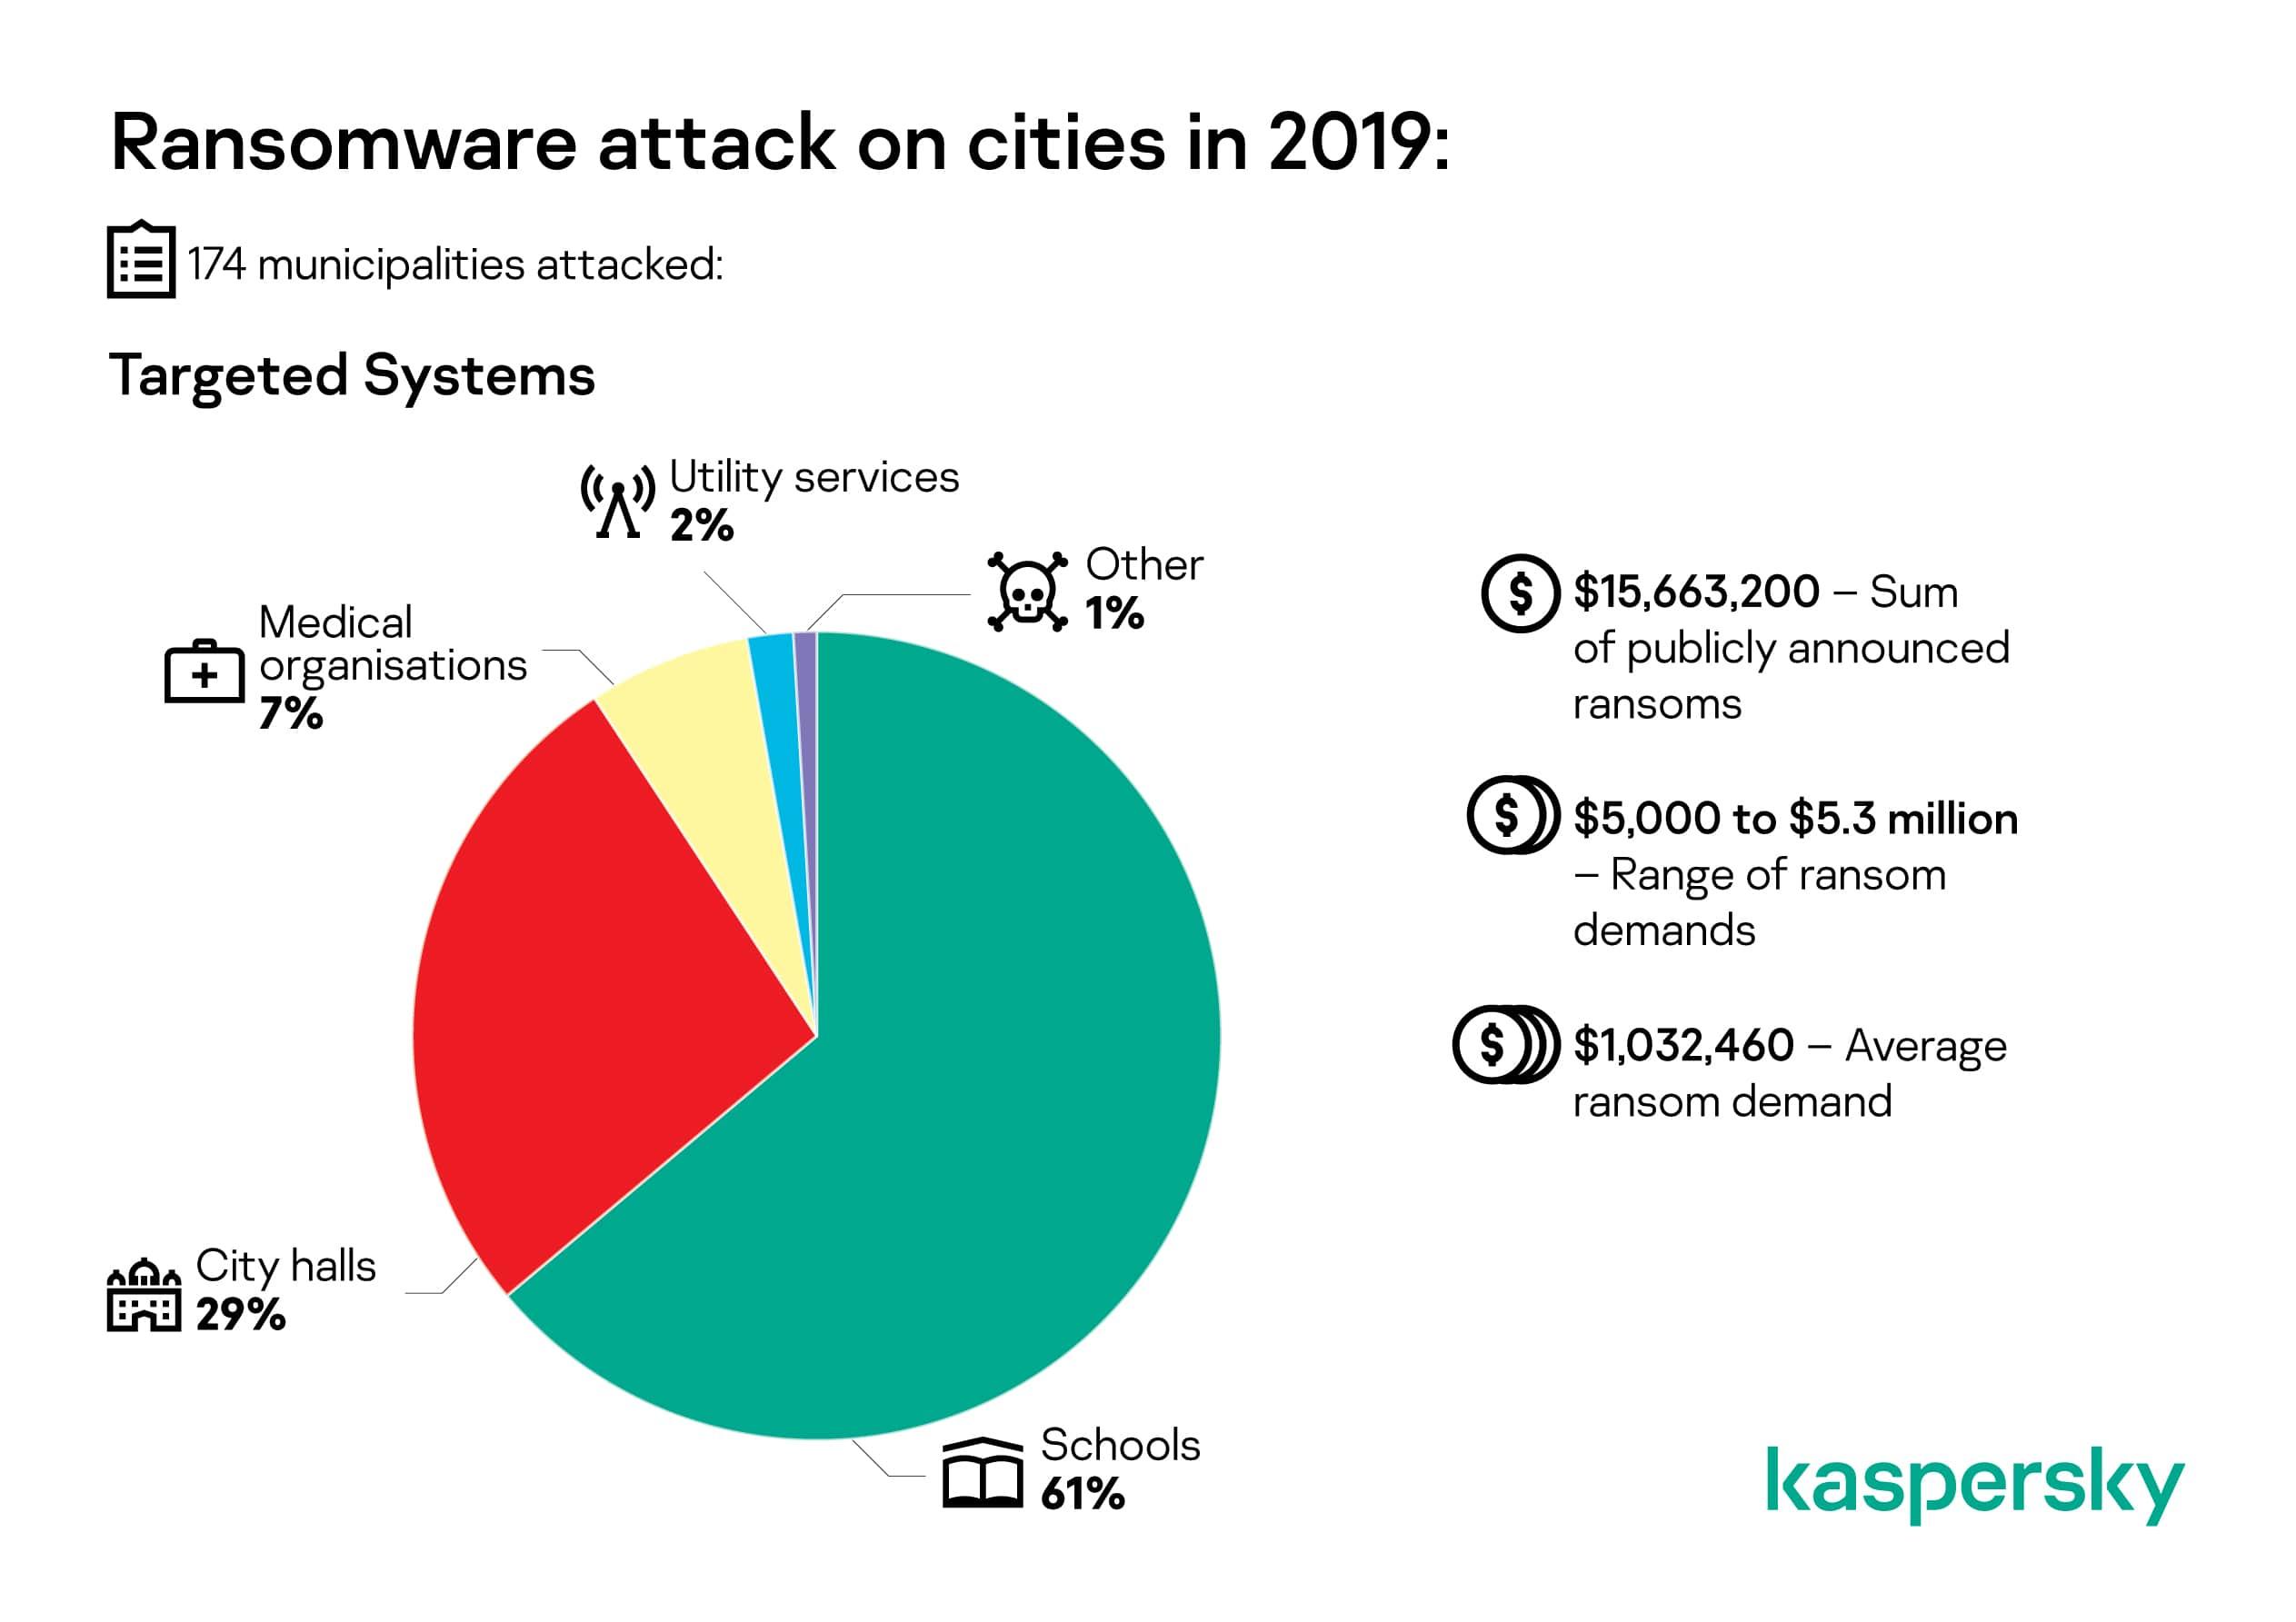 ransomware-vs-cities.jpg